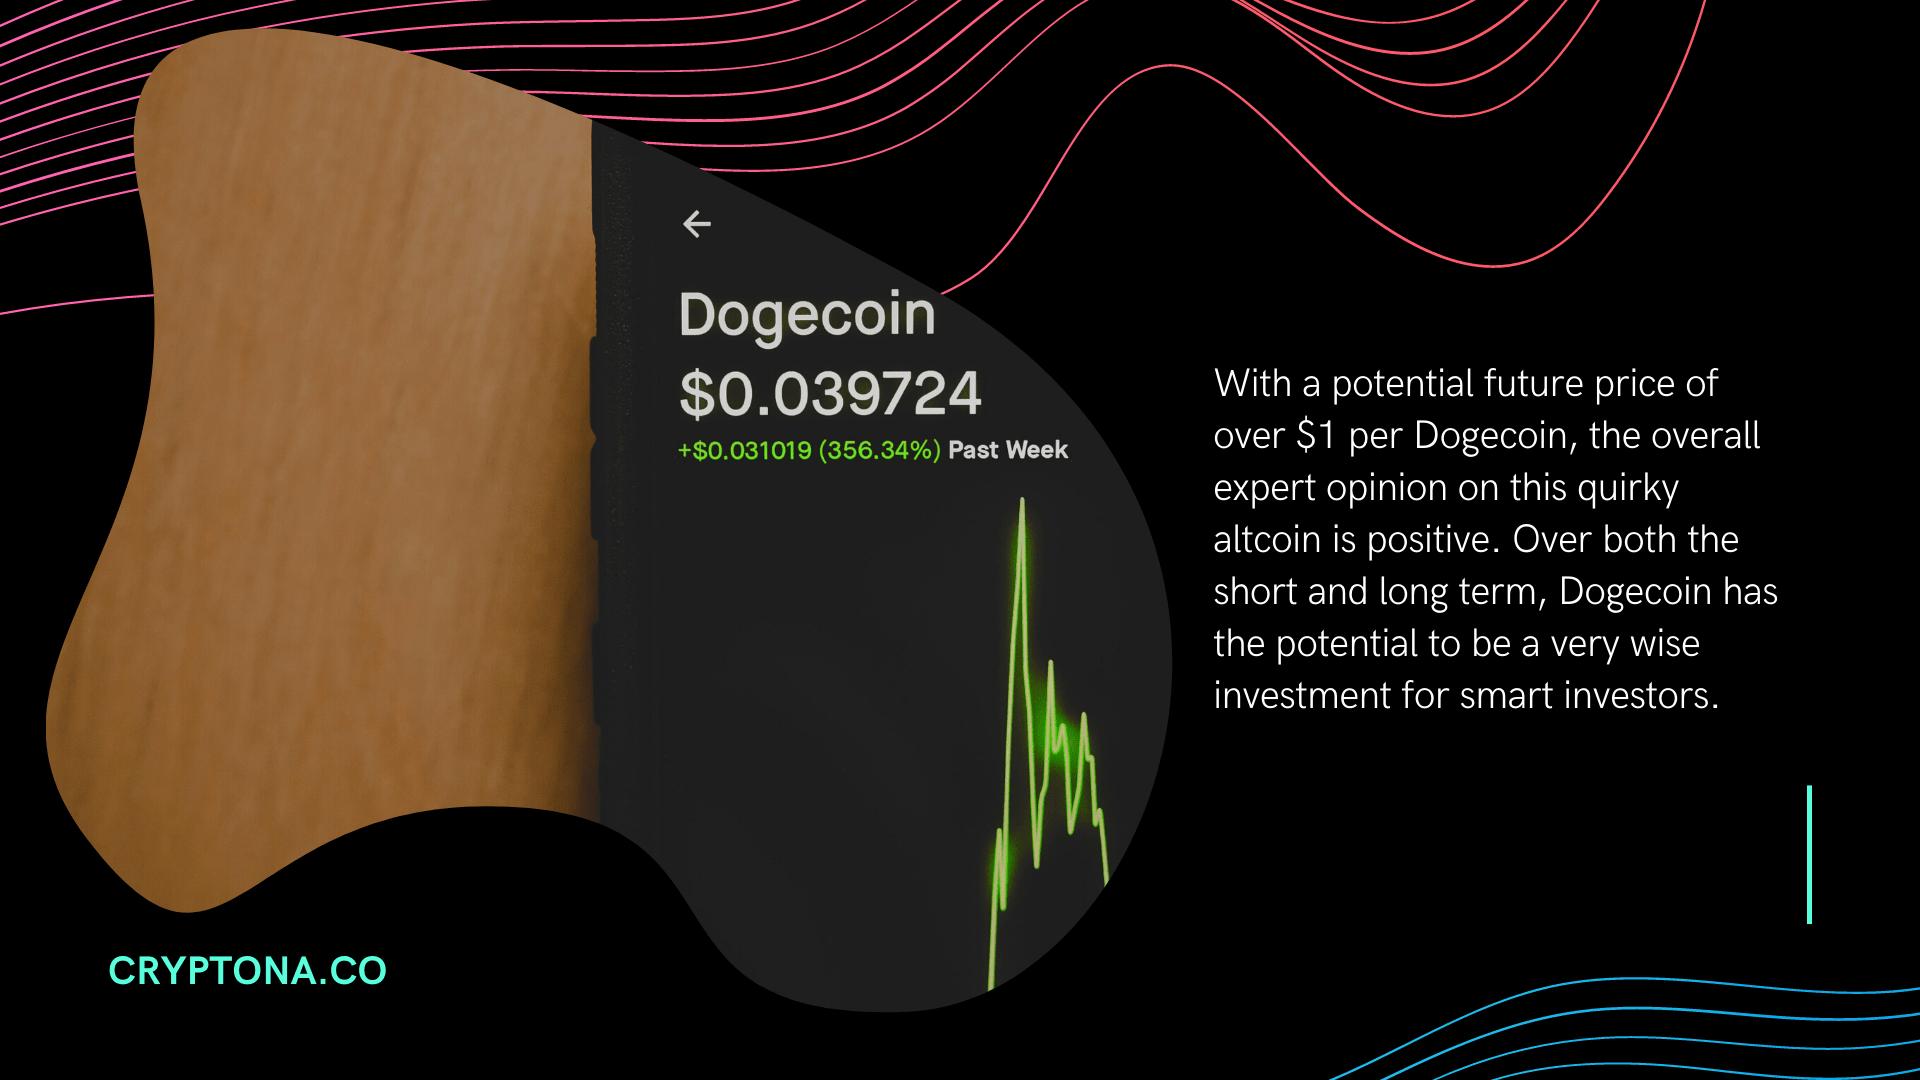 Dogecoin Price Prediction Forecast 2021-2025 – Cryptona